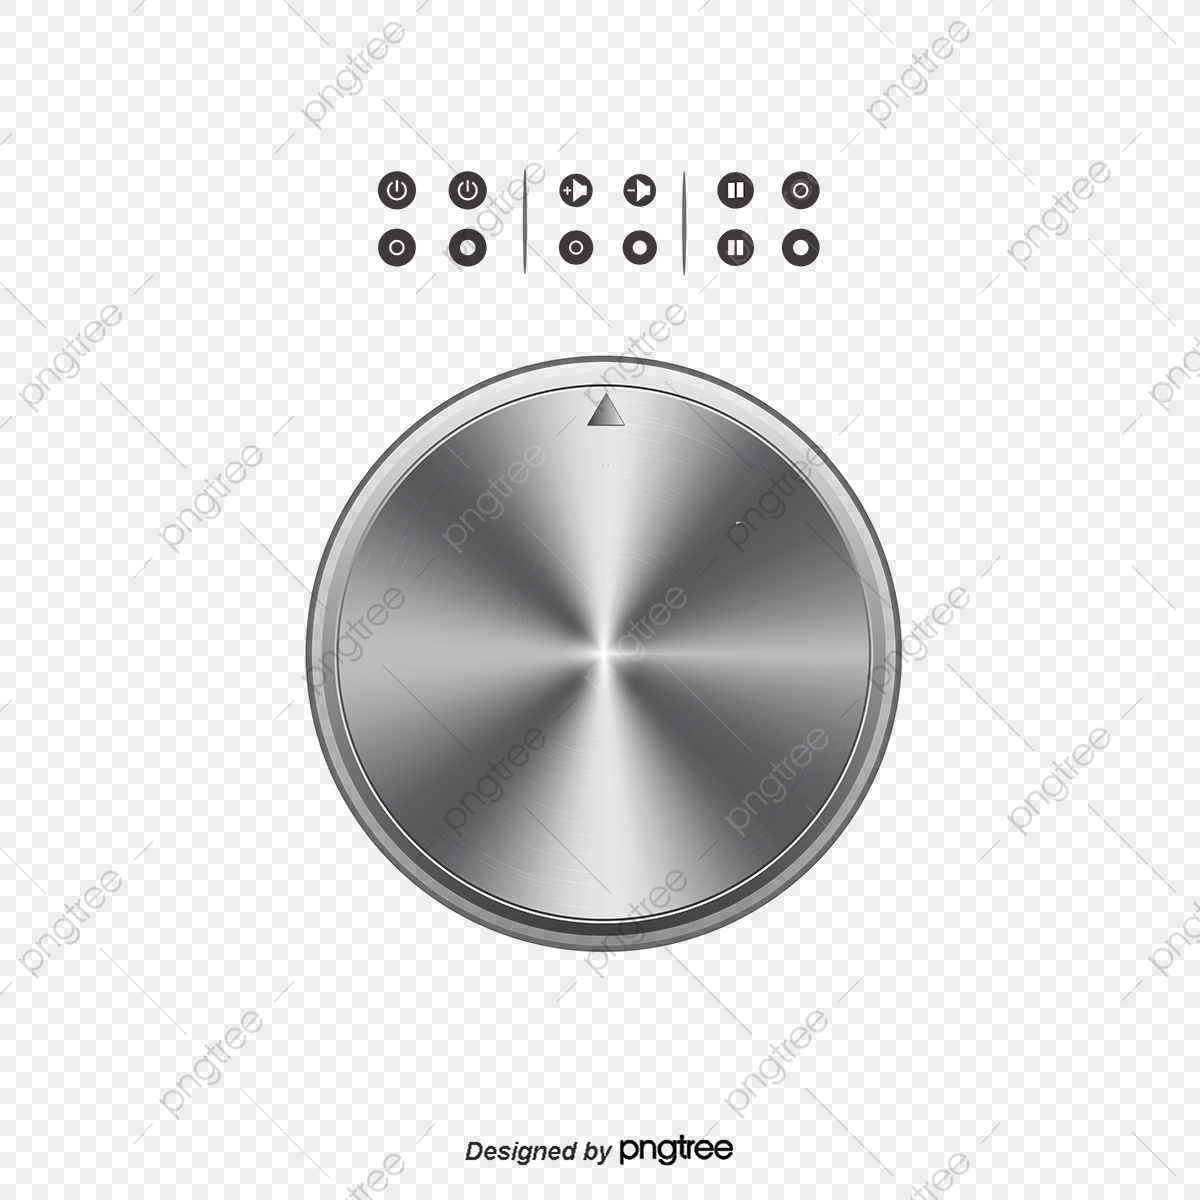 Off Switch And Volume Control Knob Symbols, Switch, Shutdown.